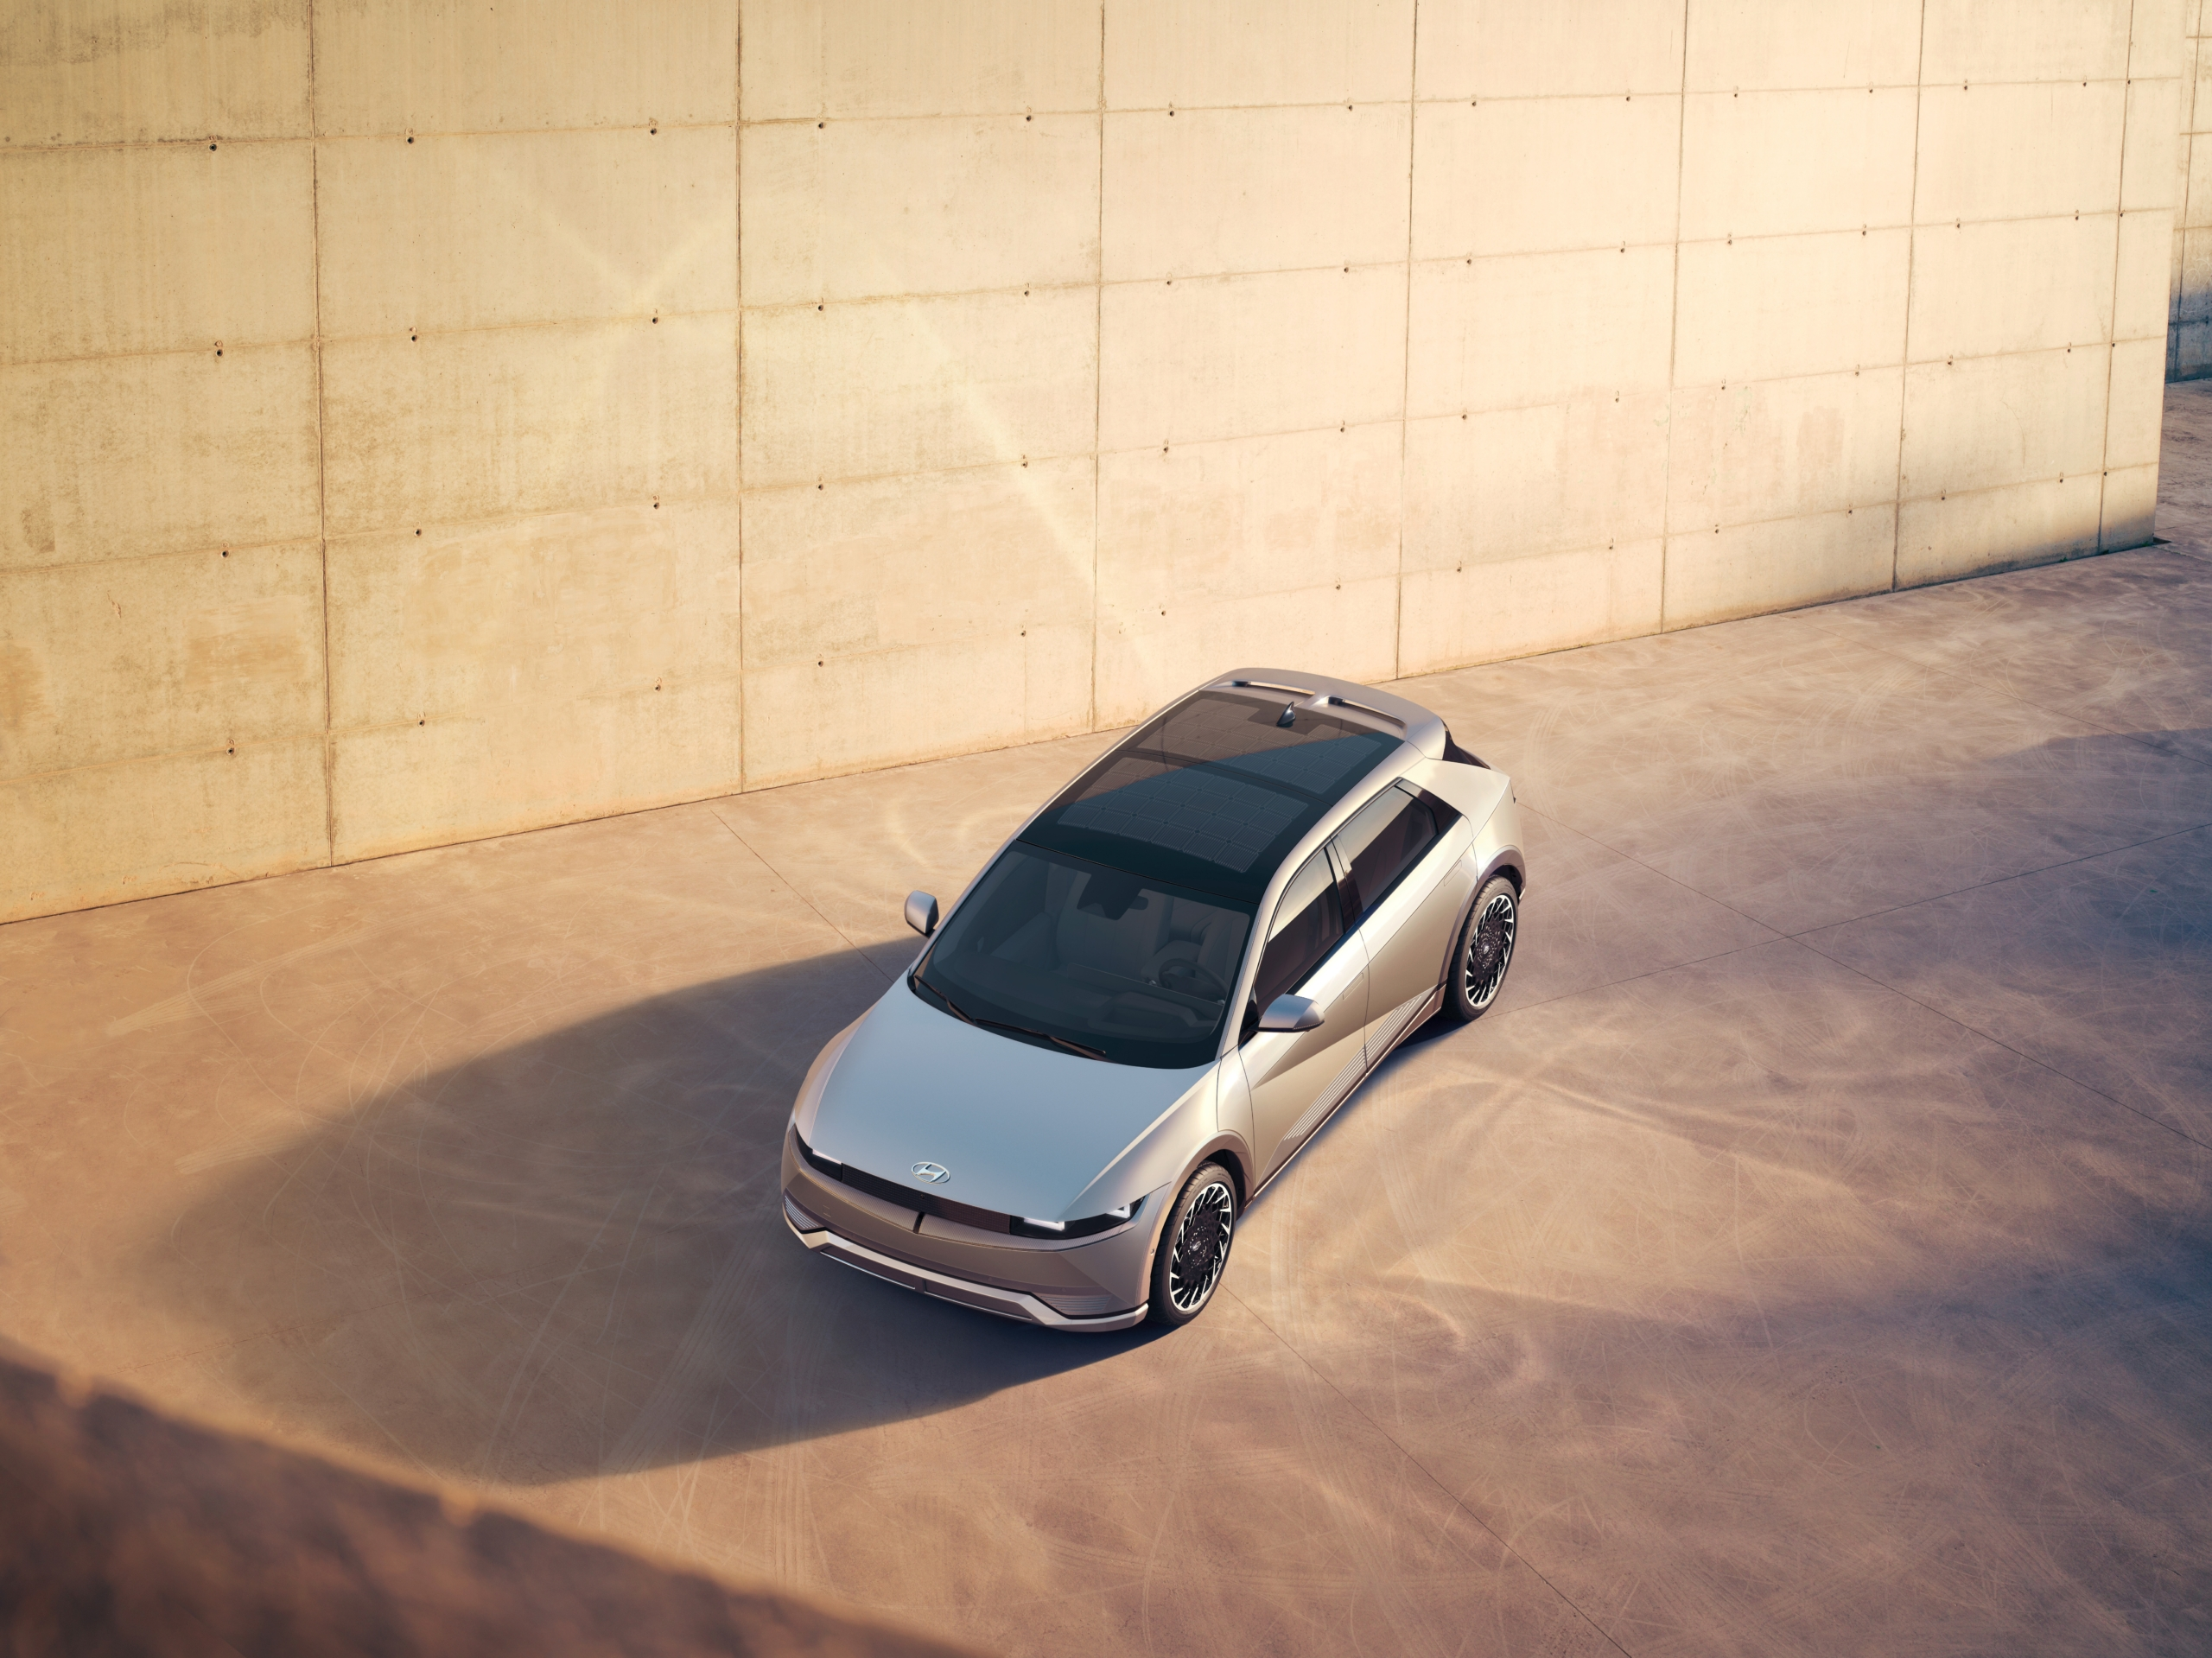 Hyundai Ioniq 5 above